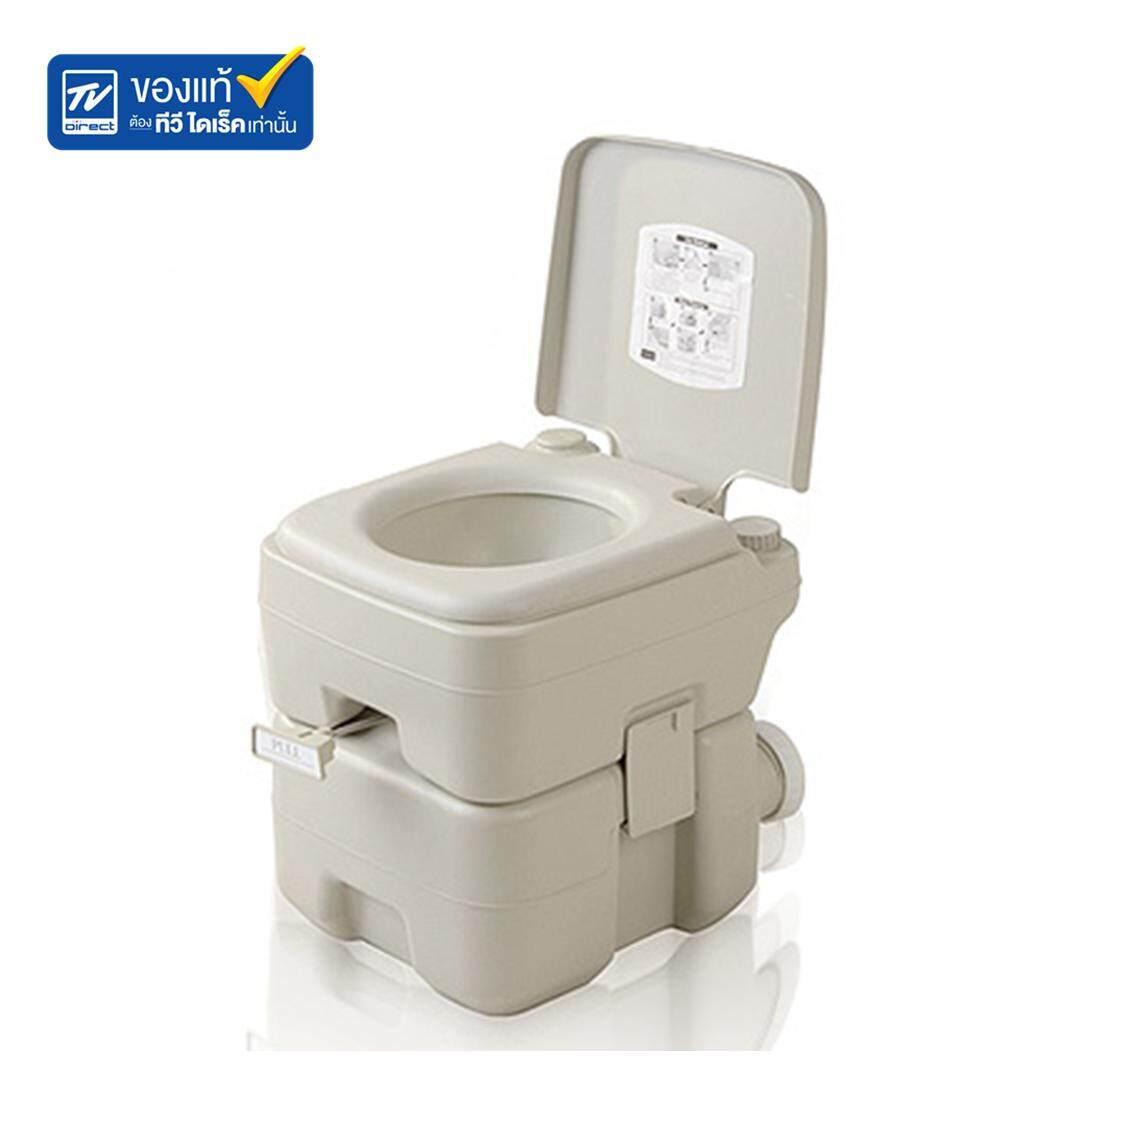 Tvdirect  สุขาเคลื่อนที่ Portable Toilet.